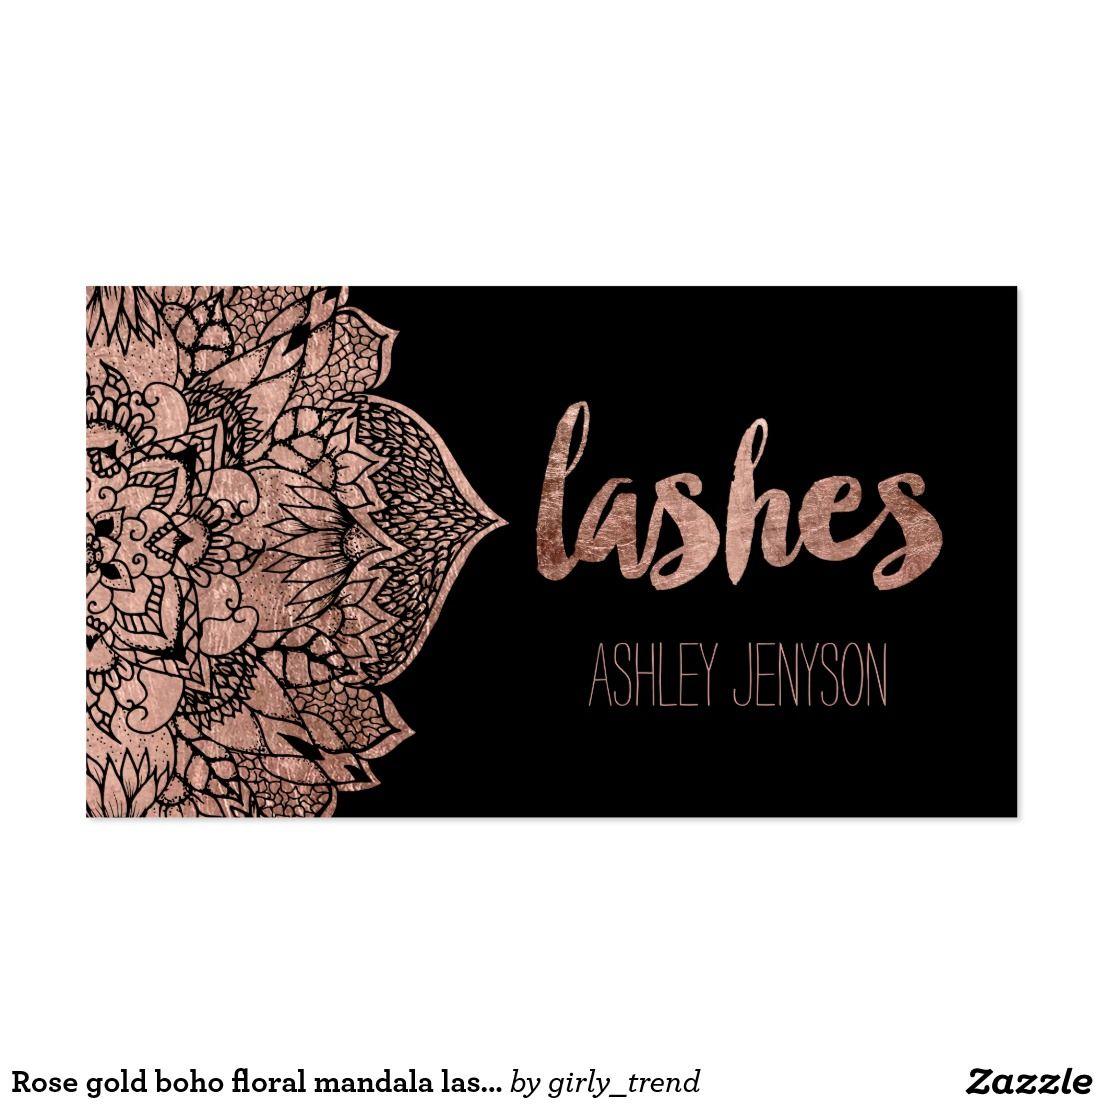 Rose gold boho floral mandala lashes typography business card ...